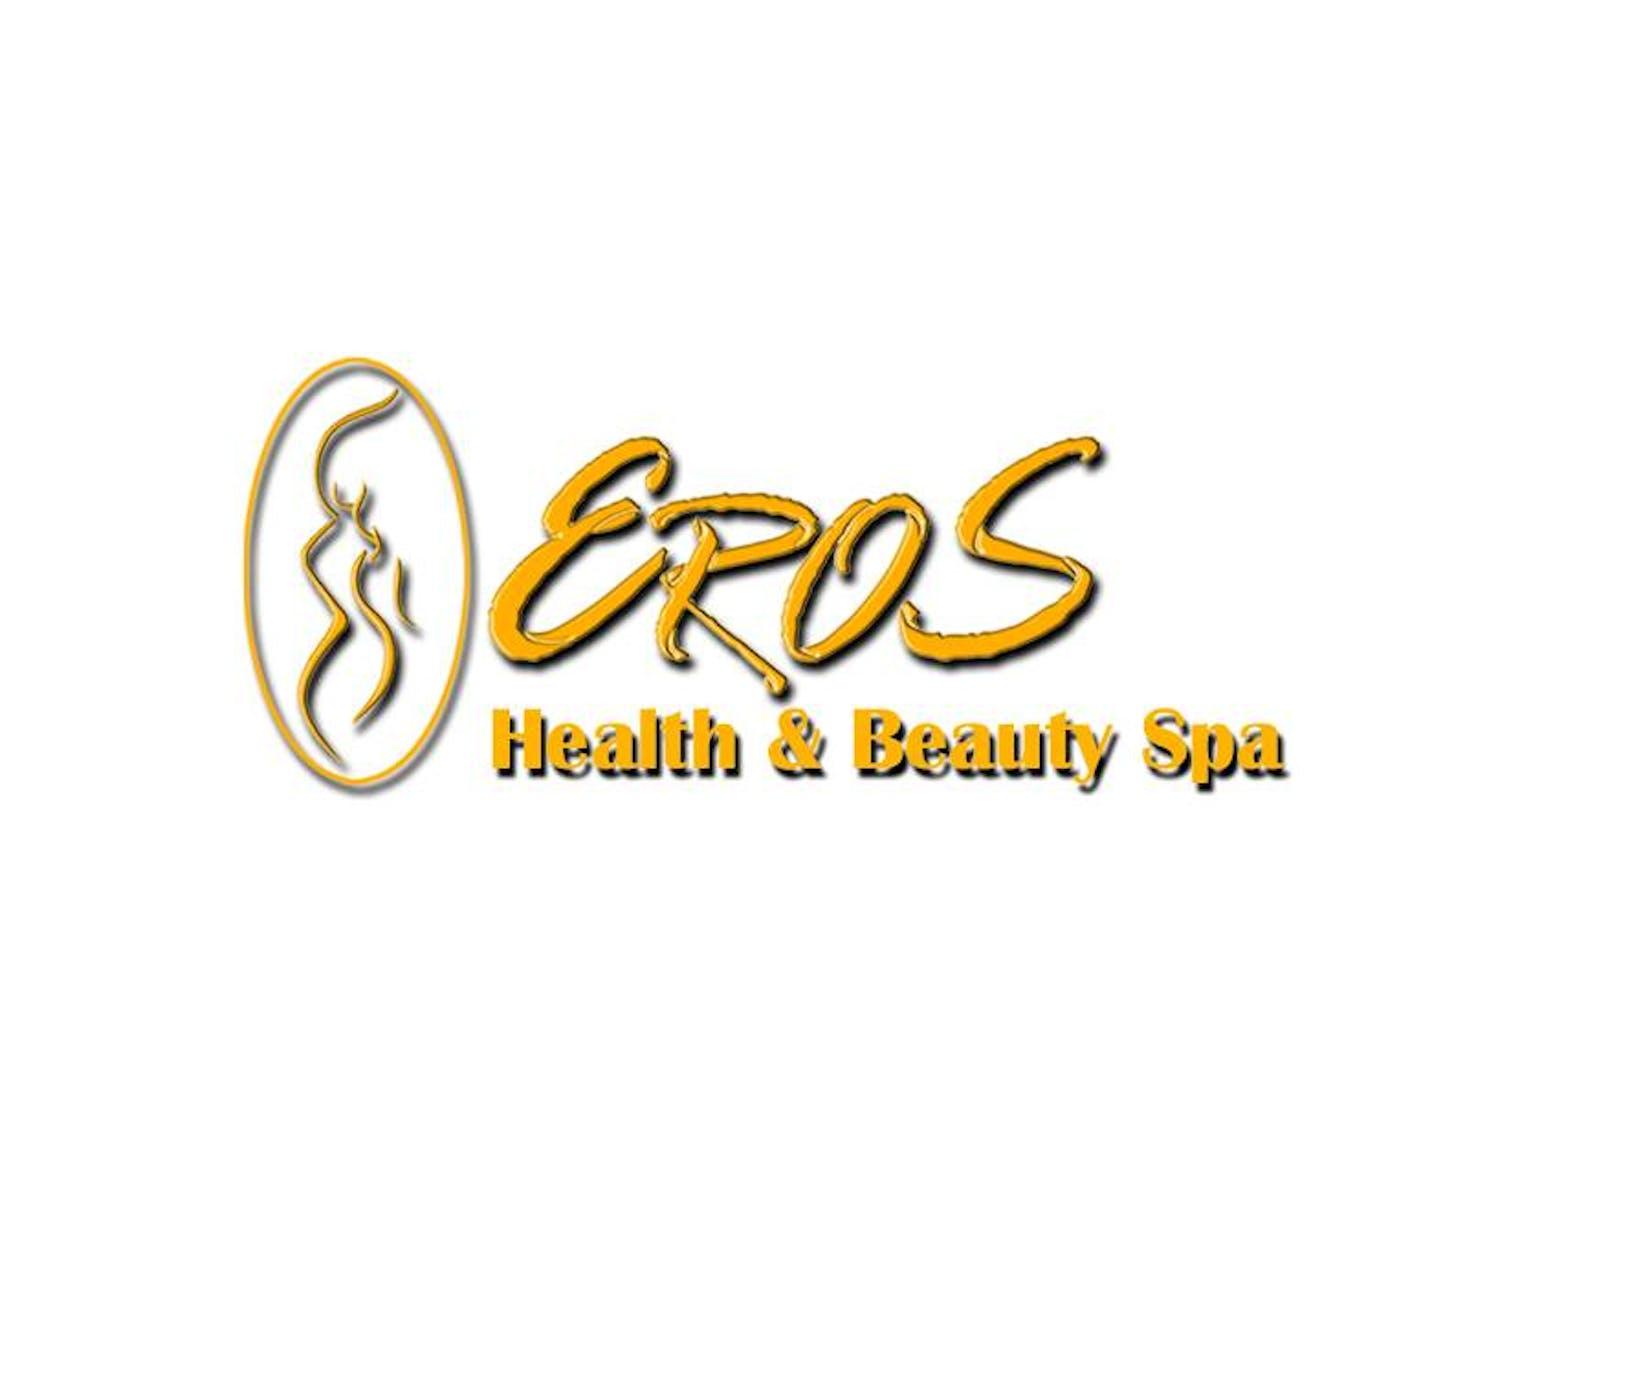 Eros Health & Beauty Spa | Beauty